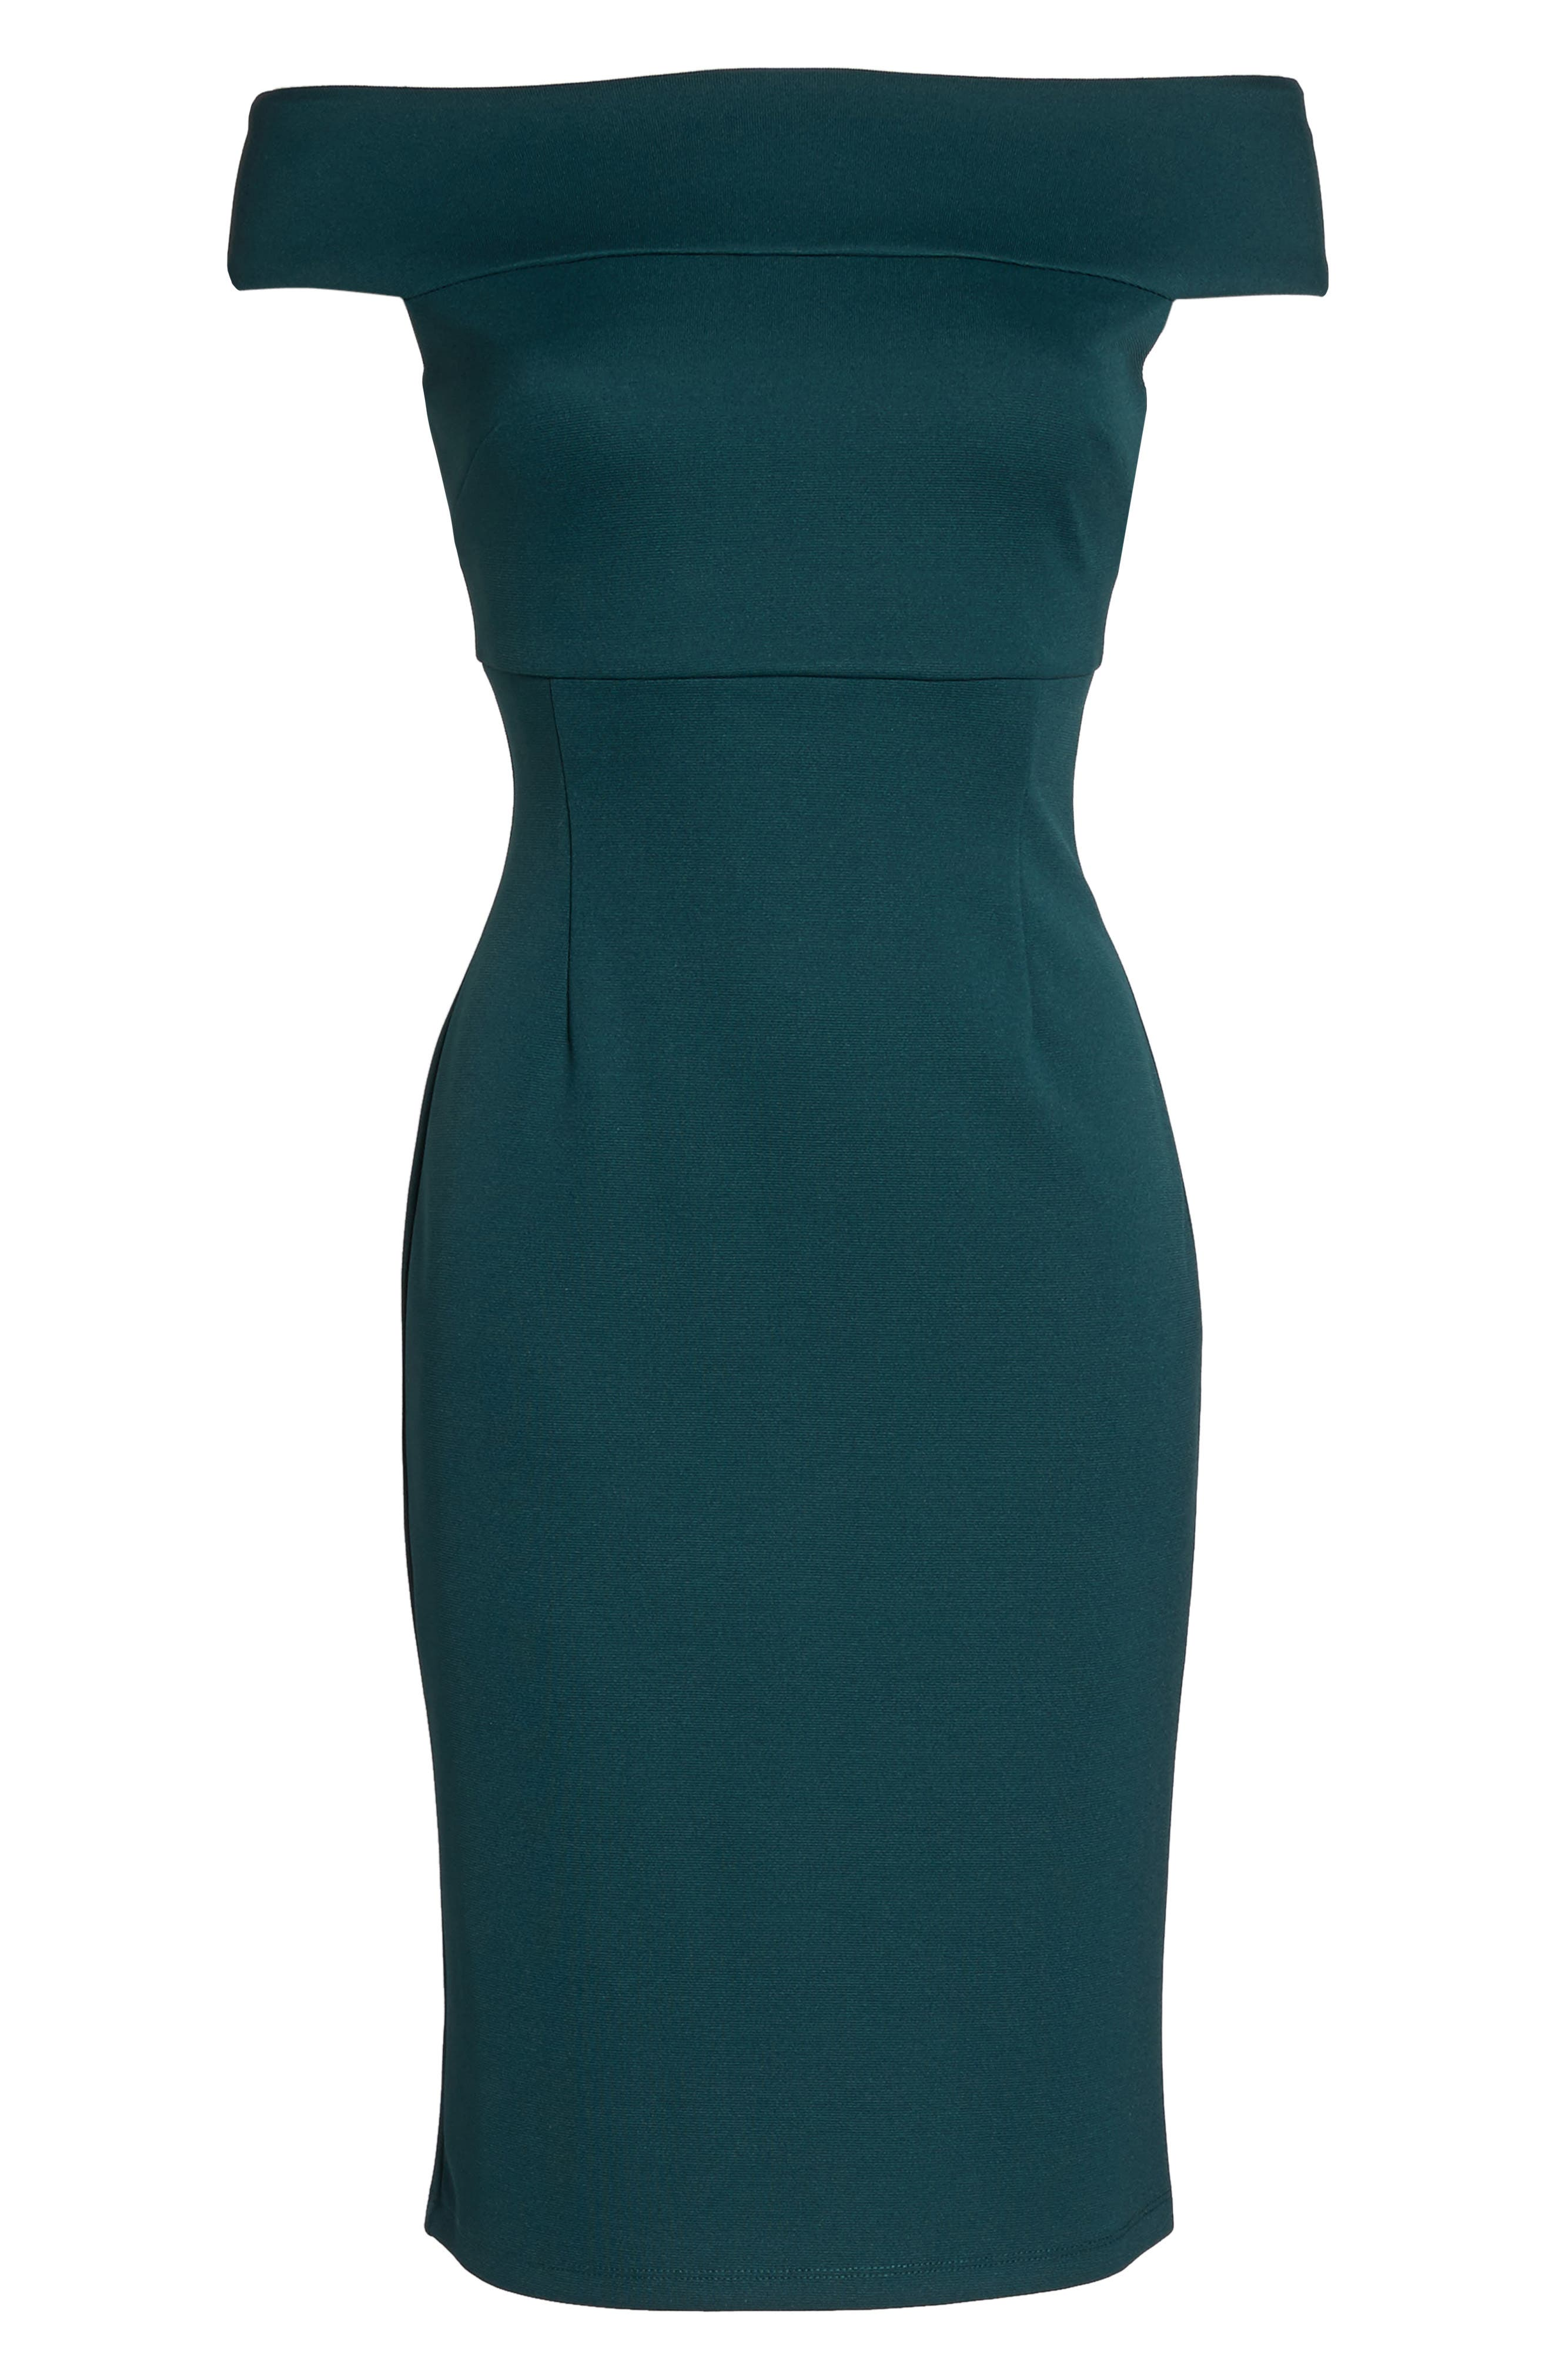 Sheath Dress,                             Alternate thumbnail 11, color,